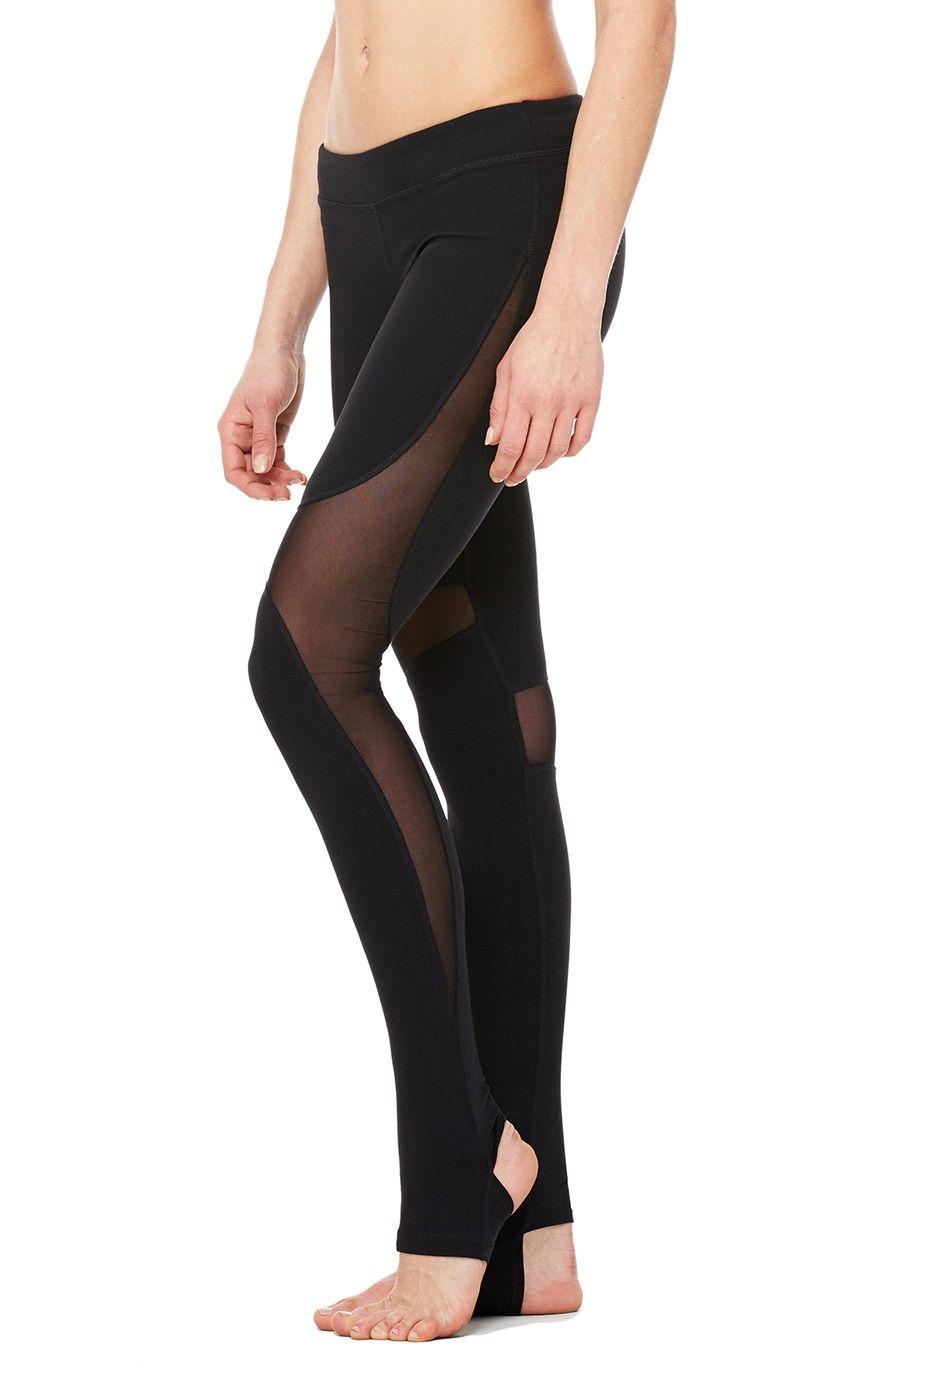 0e70c8ea71722 Coast Legging | Training Time | Women's leggings, Yoga leggings ...